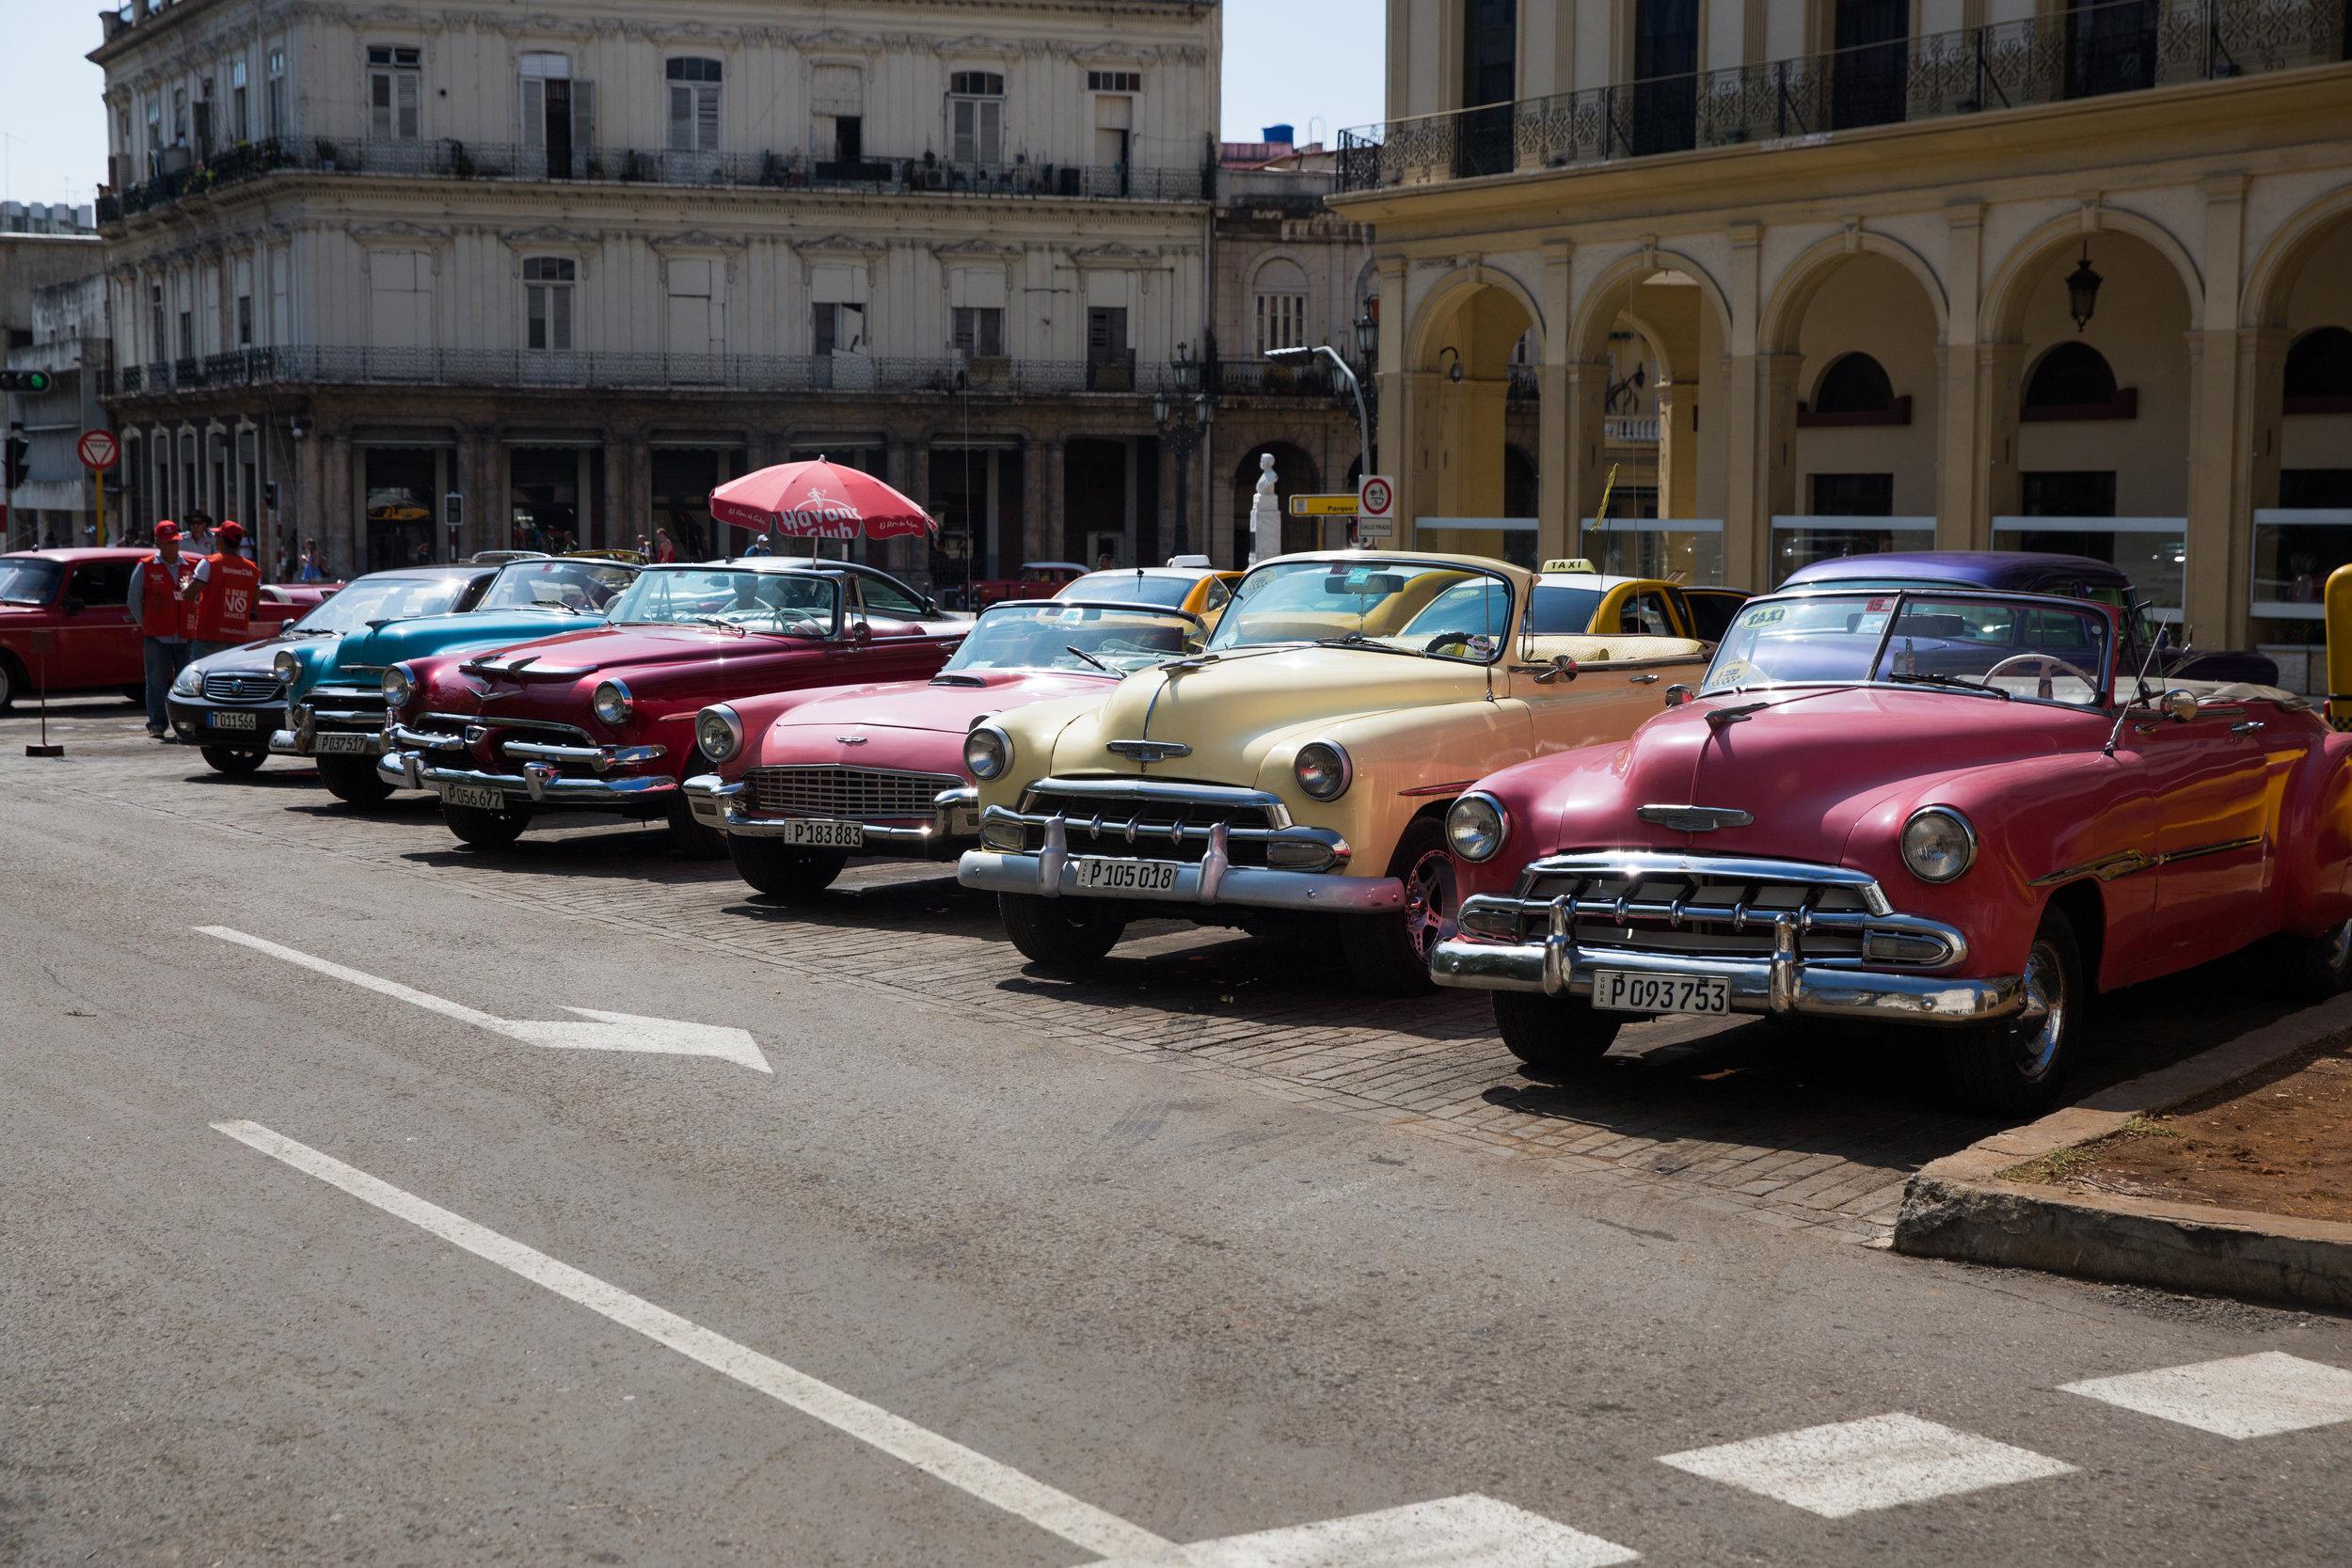 Cuba had some of the most unique paintjobs I'd ever seen.